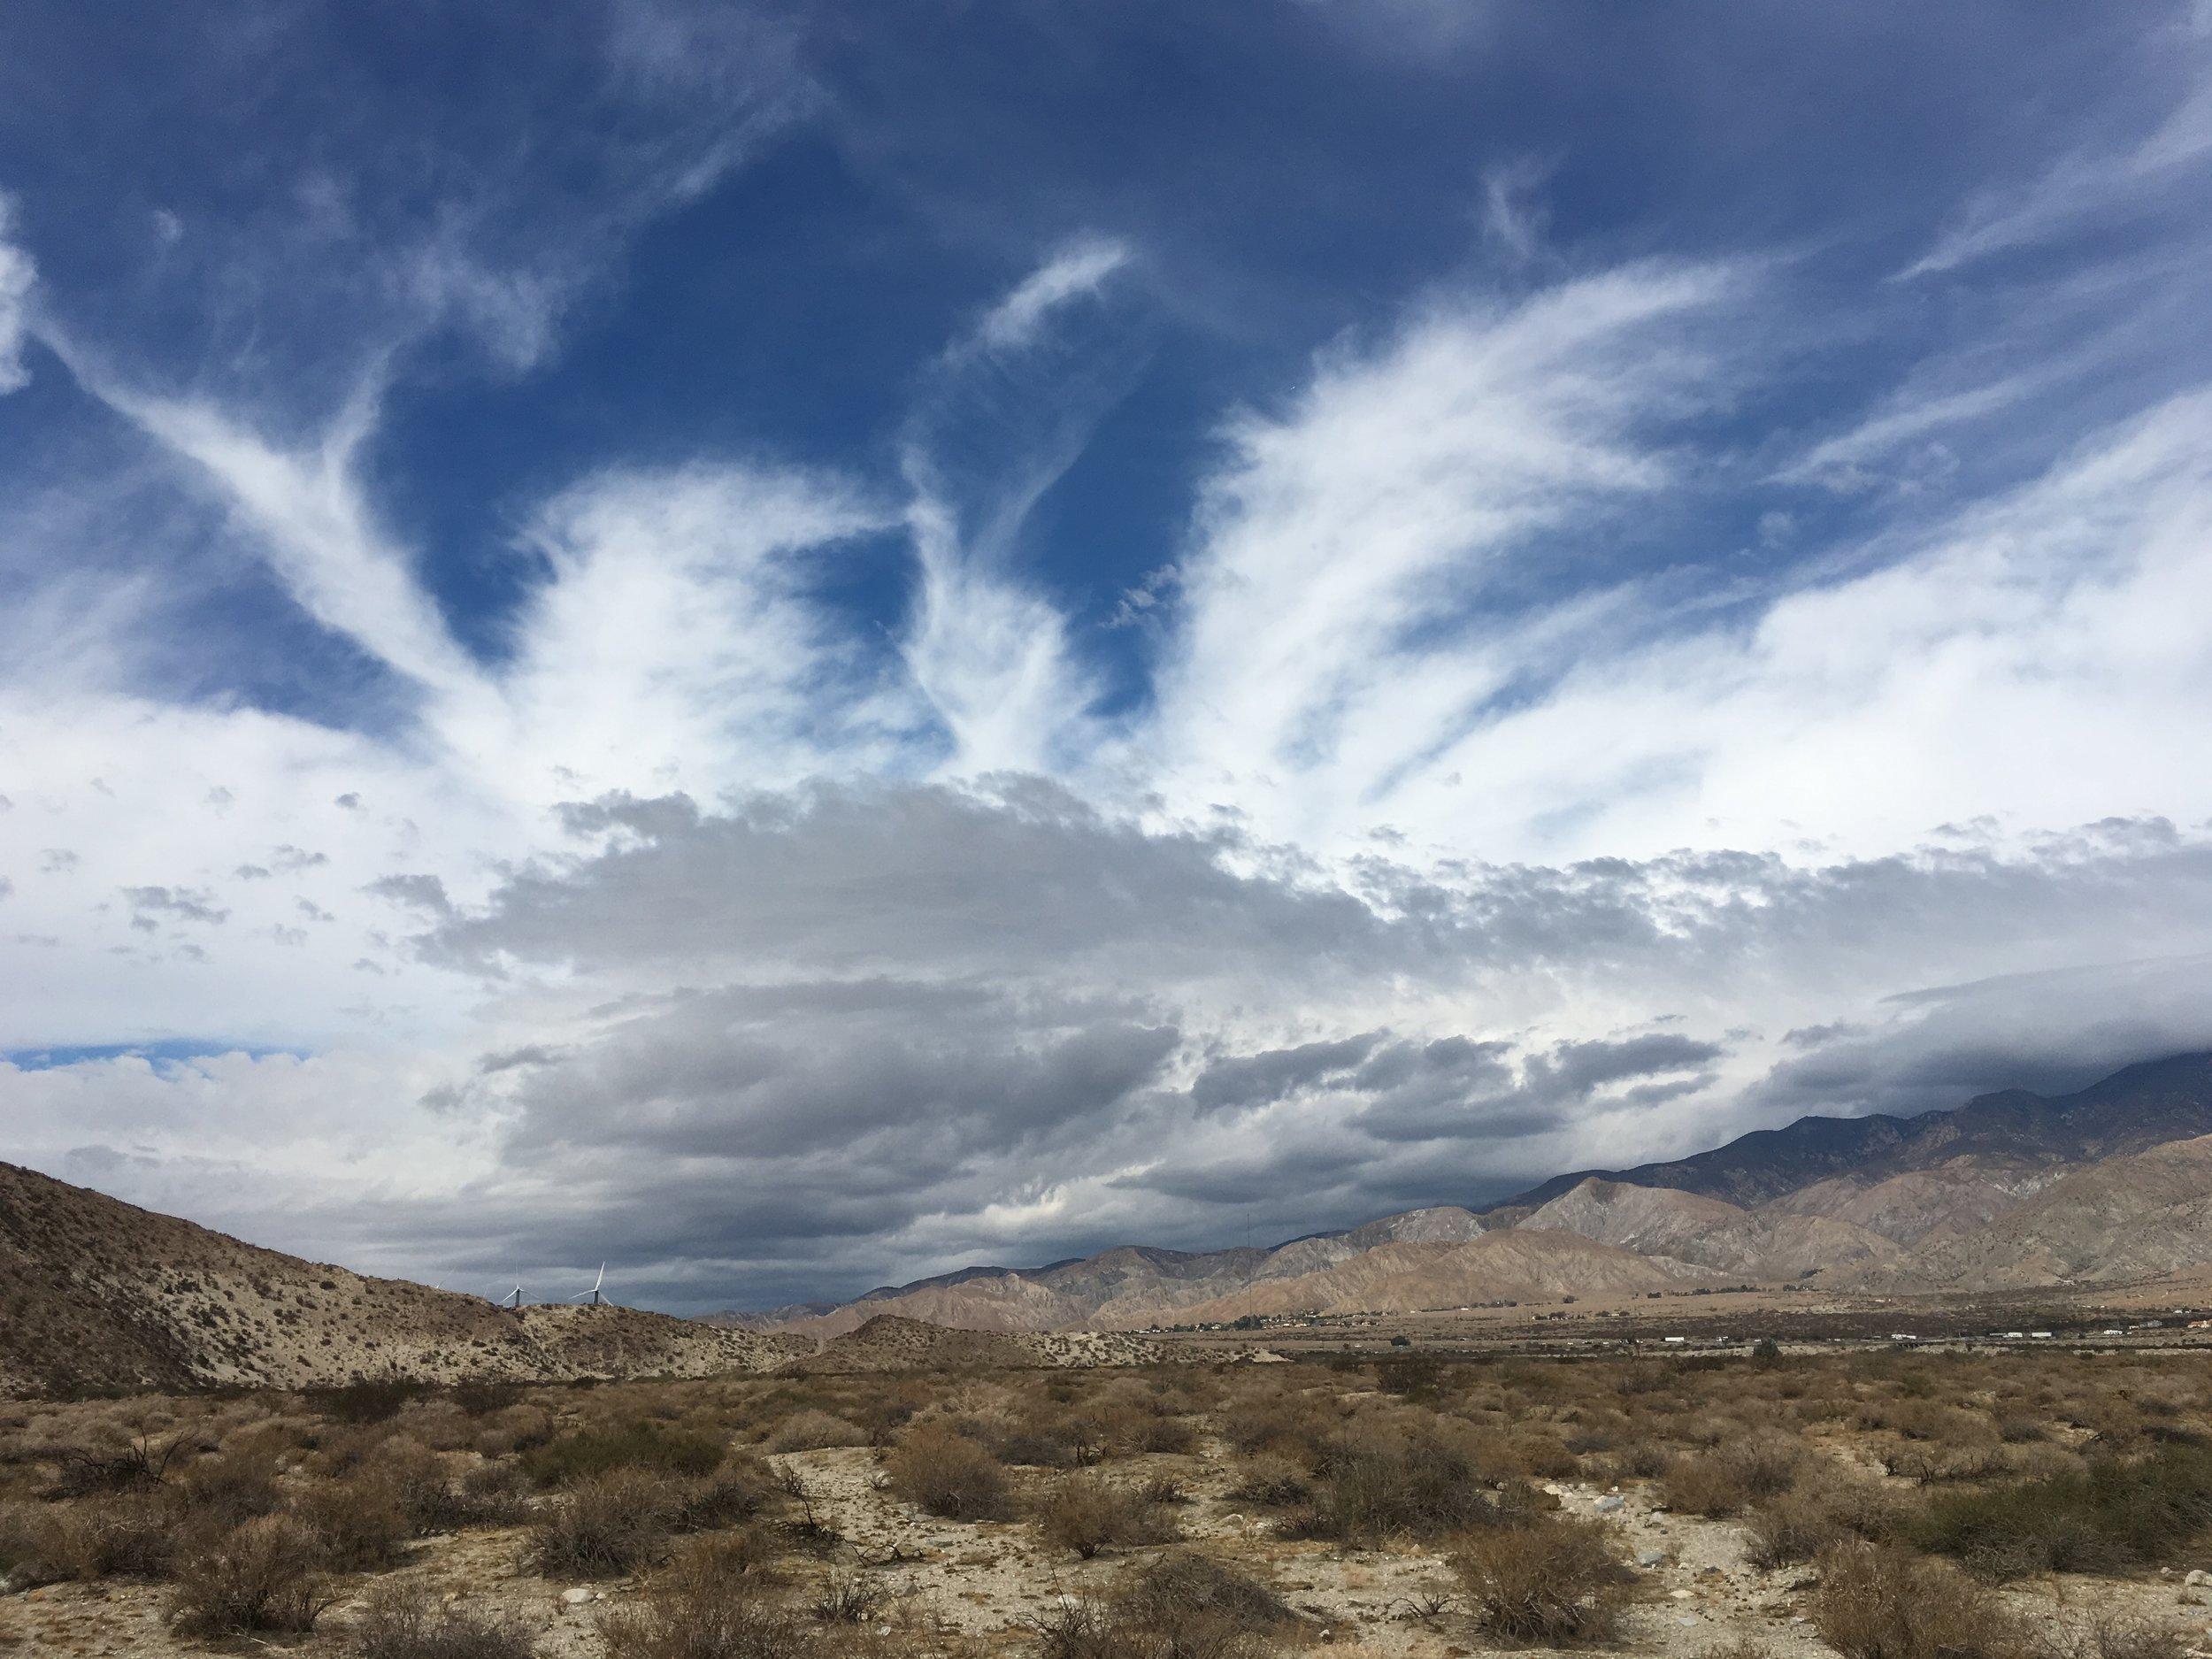 Storm clouds brewing as we cross the desert.